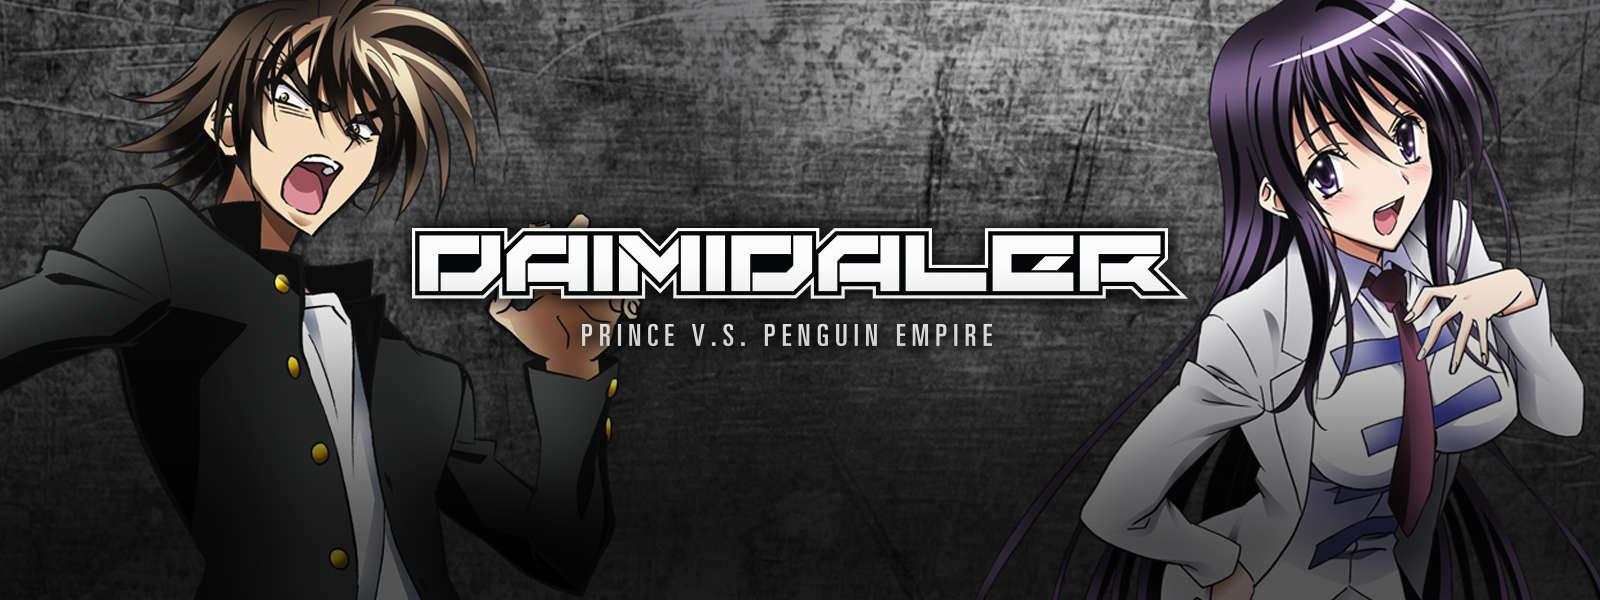 DAIMIDALER: PRINCE VS. PENGUIN EMPIRE